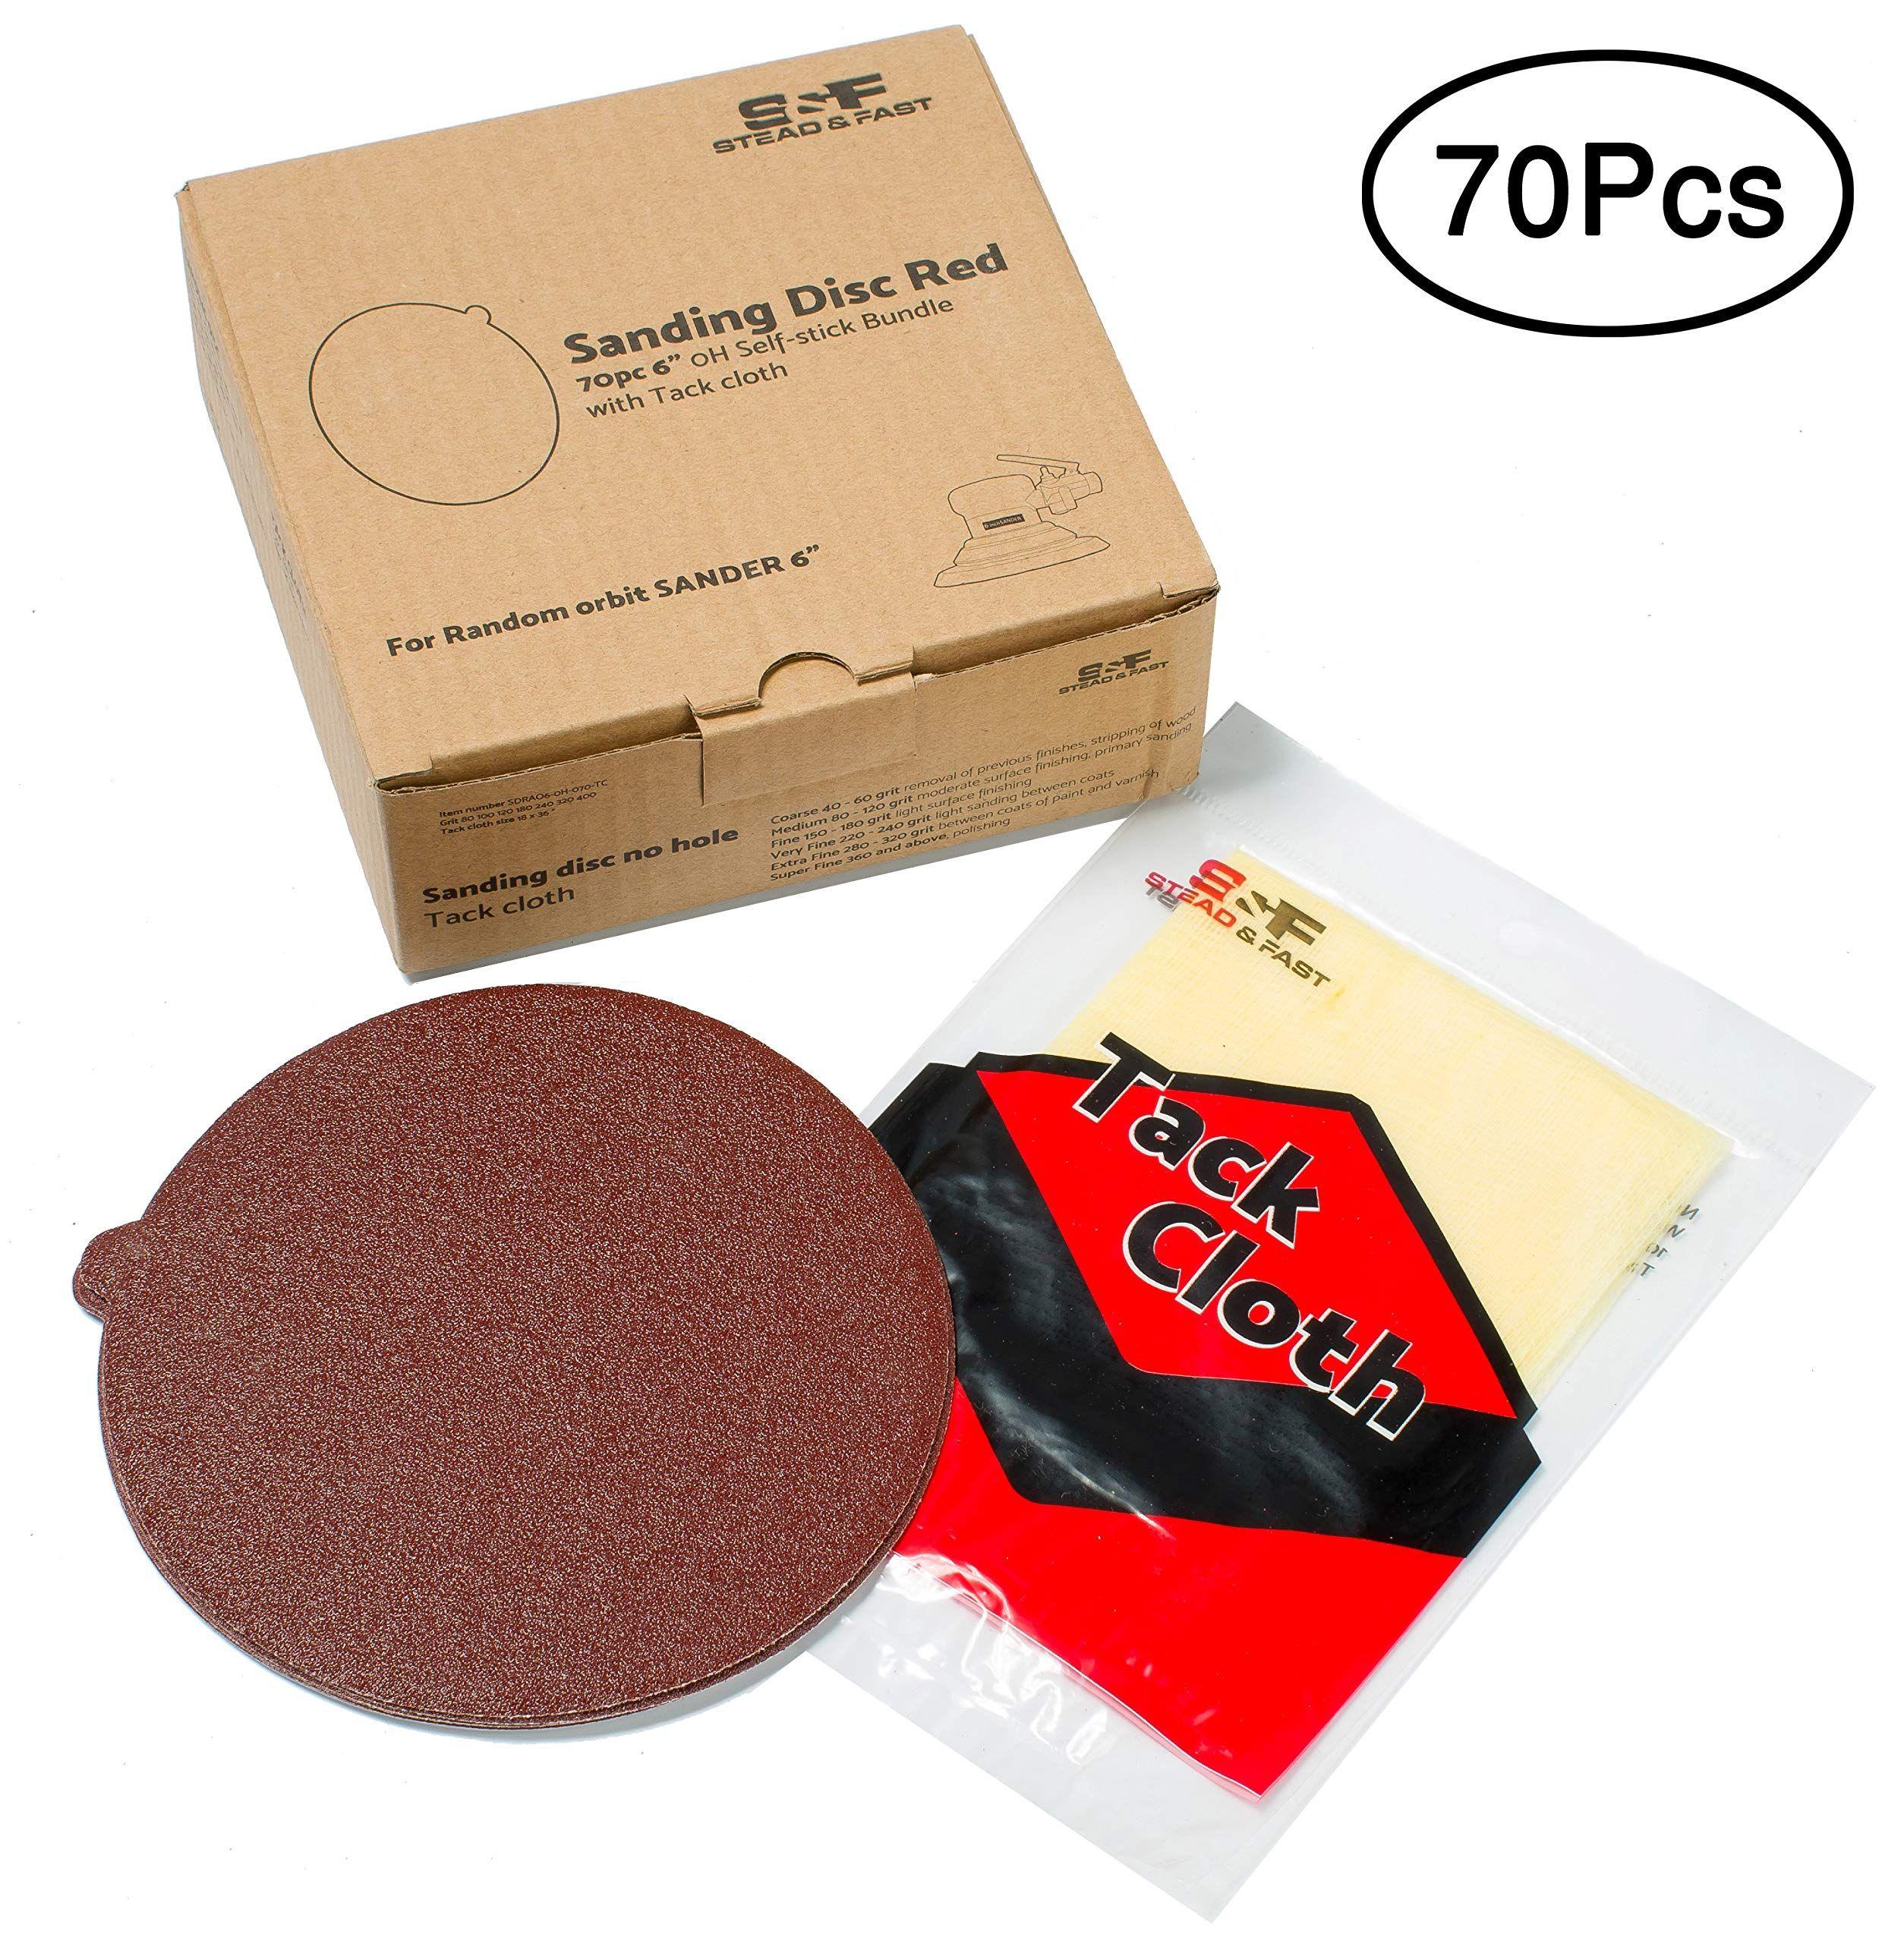 Stead And Fast 70 Pcs 6 Inch Sanding Disc Self Stick Bundle With Tack Cloth Psa Sandpaper For Disc Random Orbital And Da Sander 80 1 Sanding Sandpaper Tack